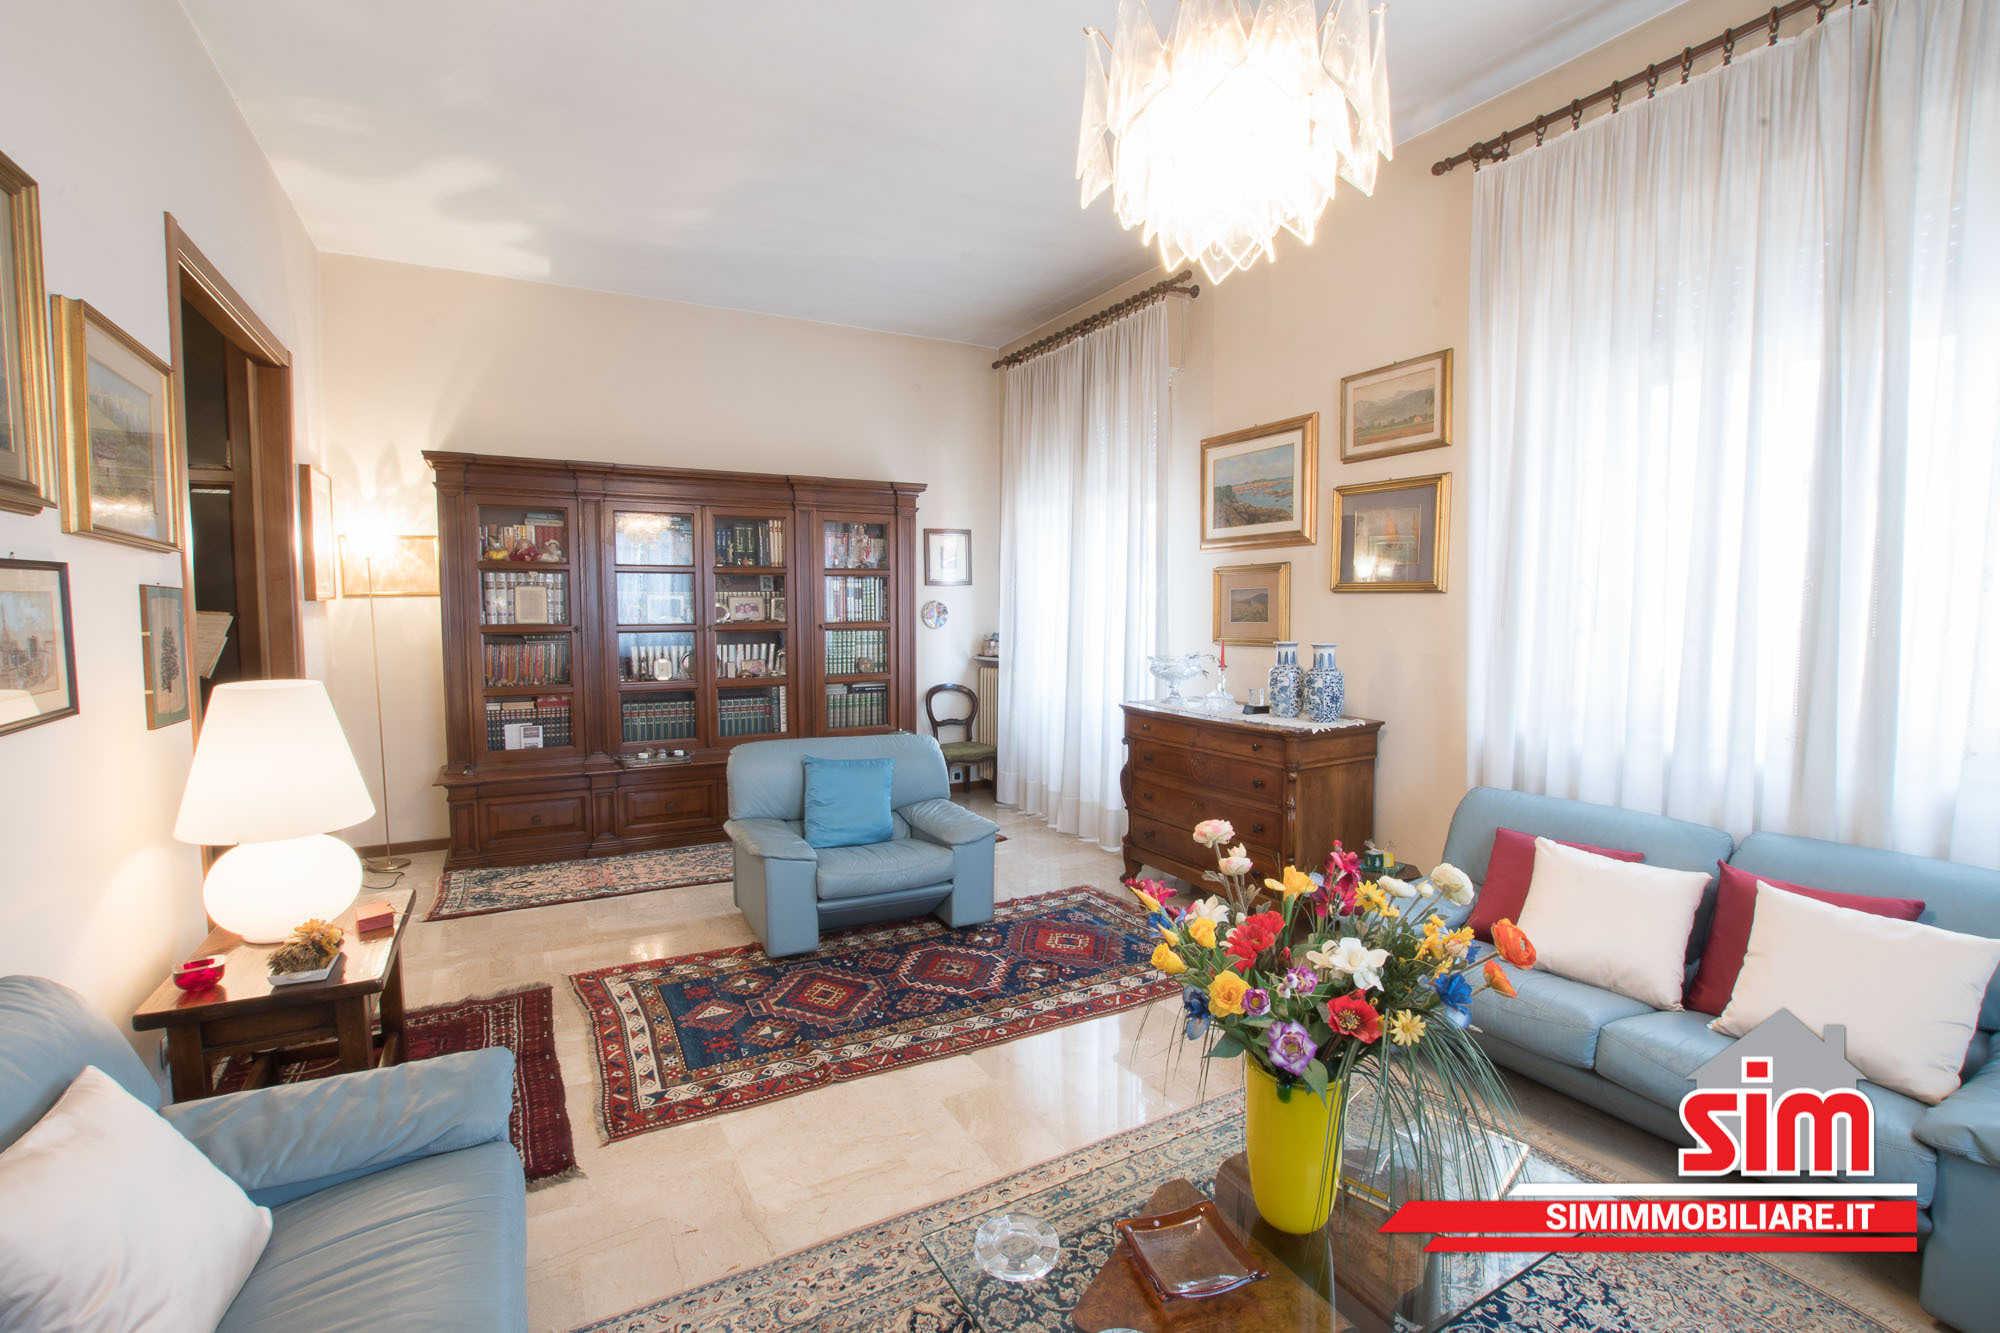 compravendite immobiliari a Novara